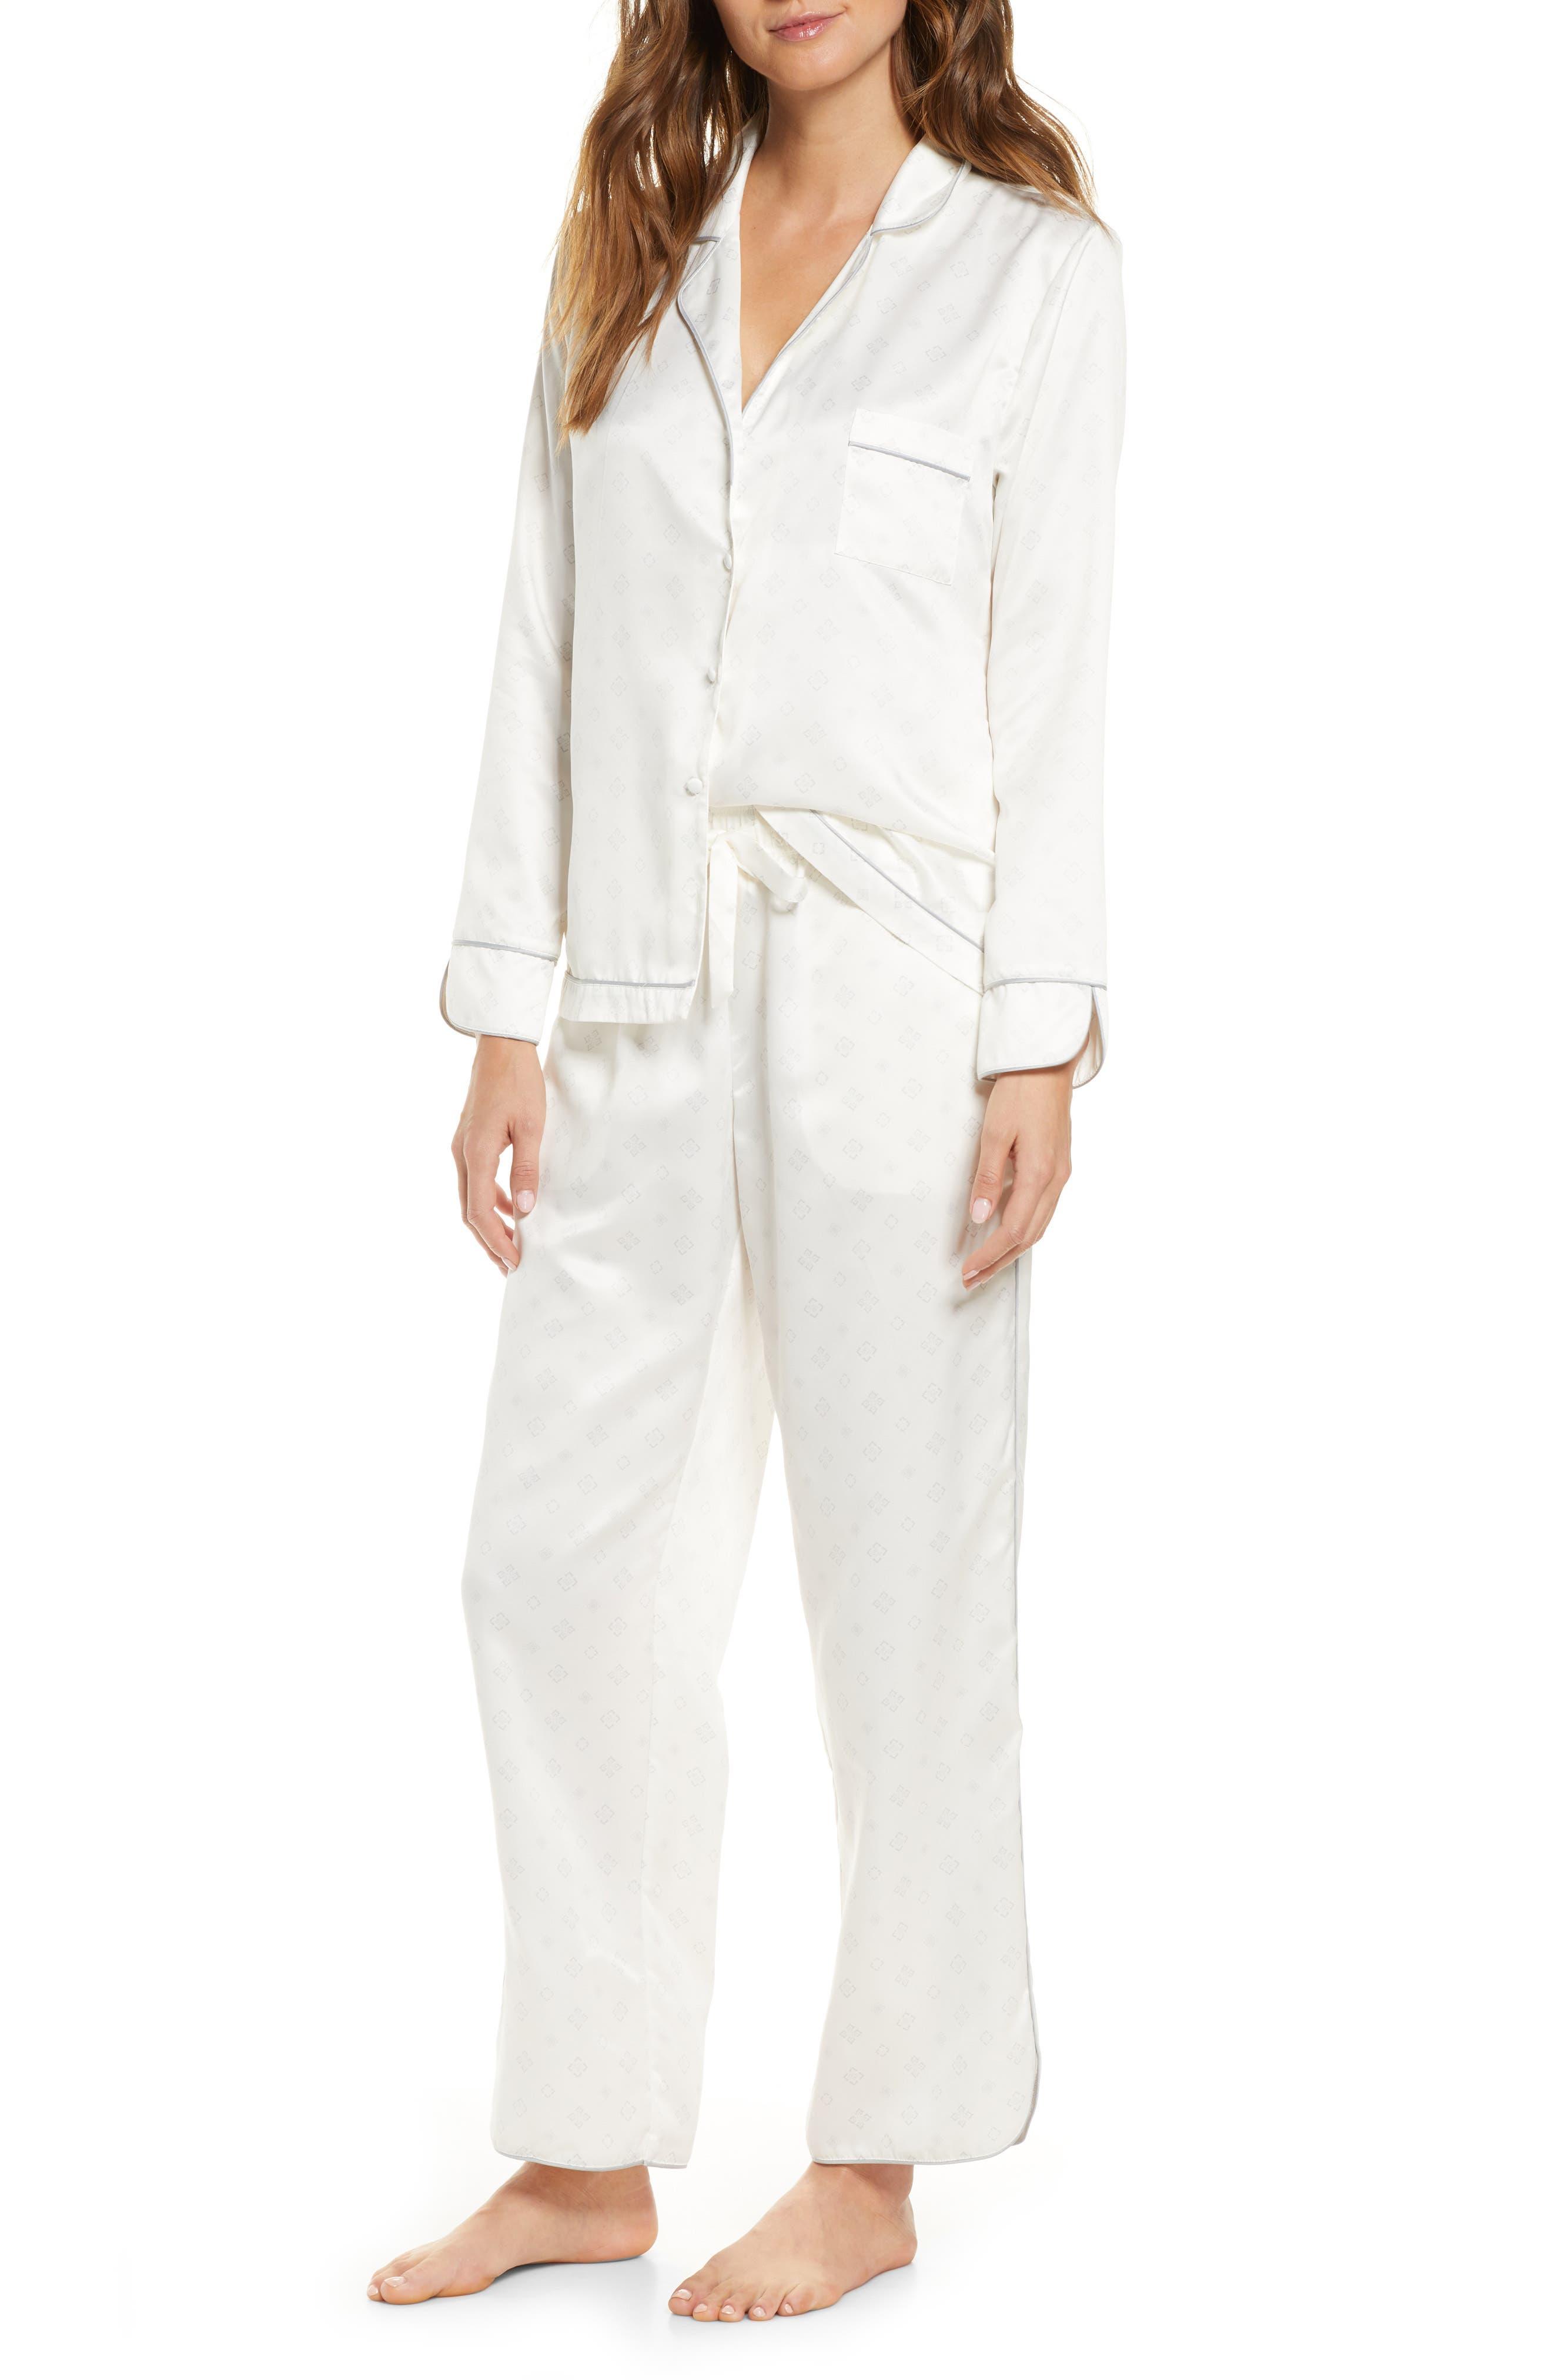 Rachel Parcell Satin Pajamas (Nordstrom Exclusive)